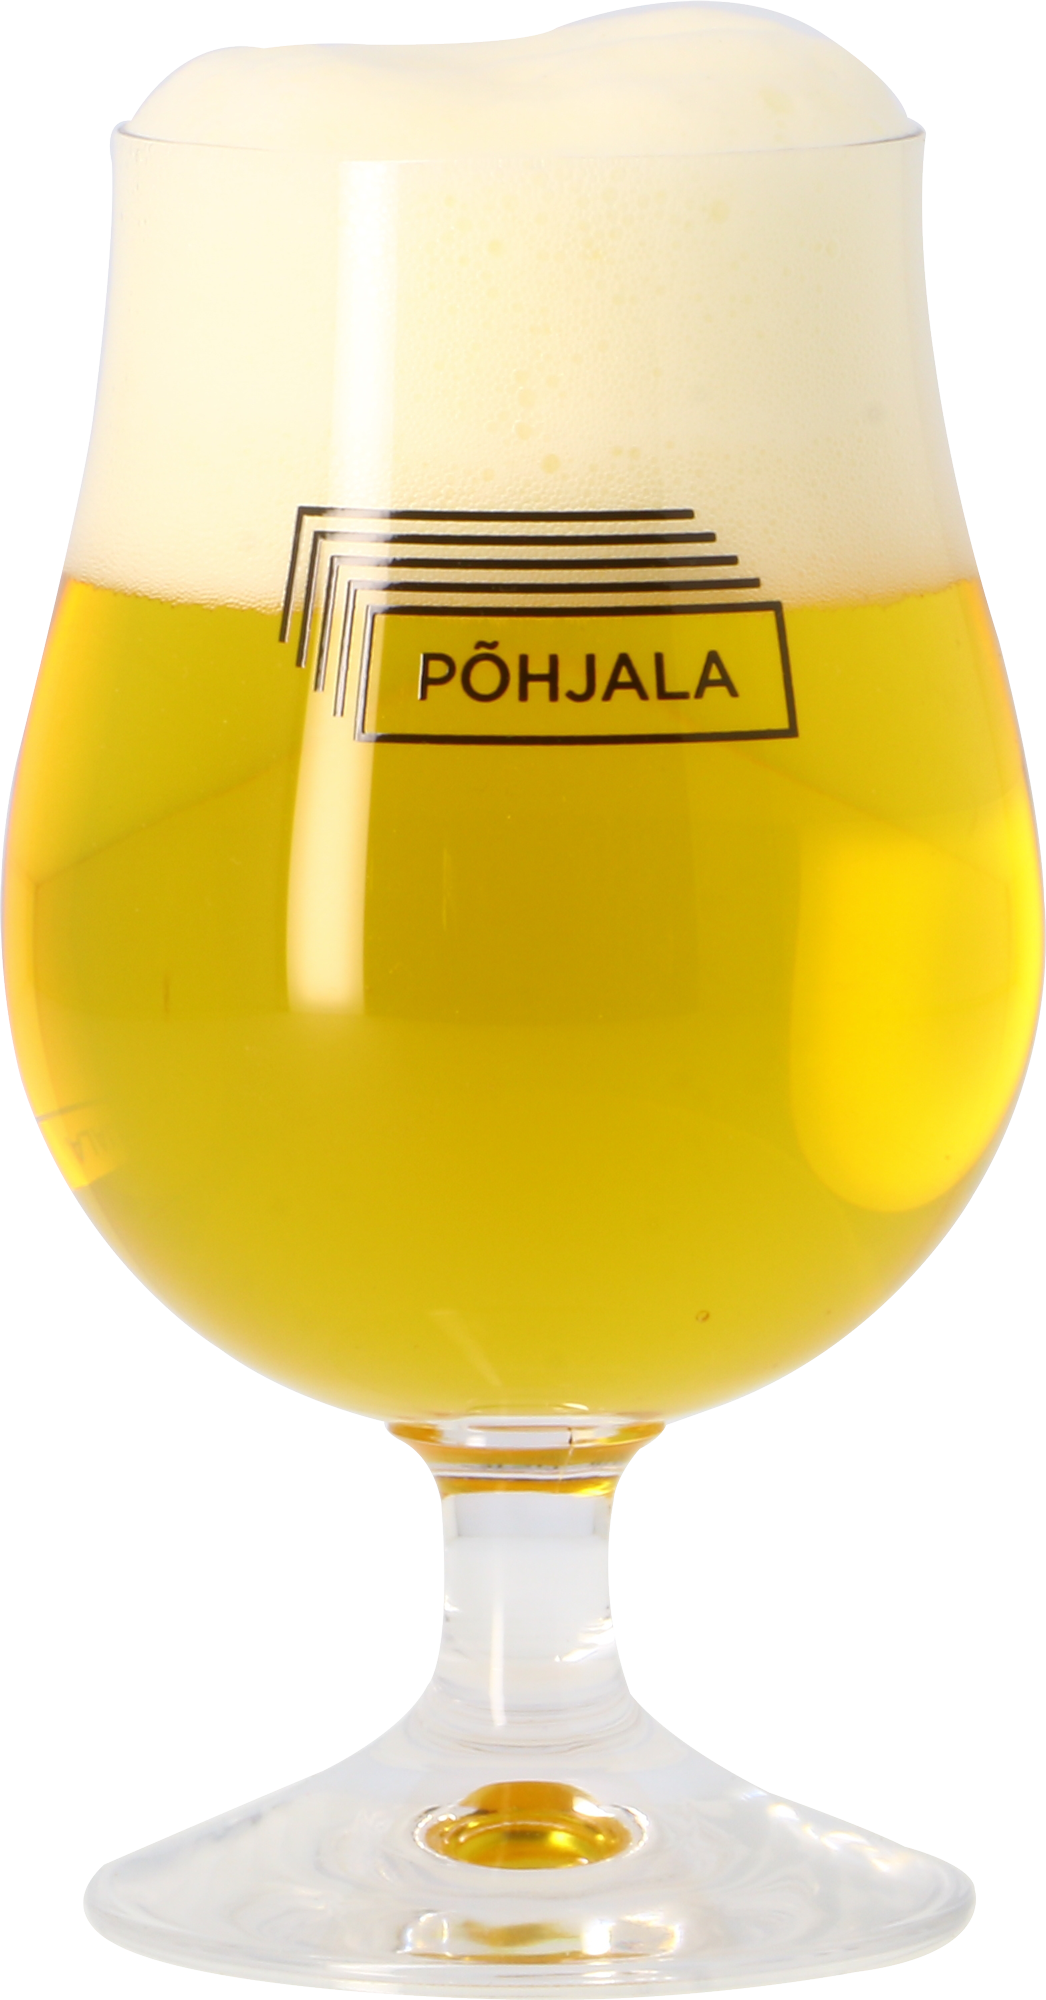 Põhjala Beer Glass